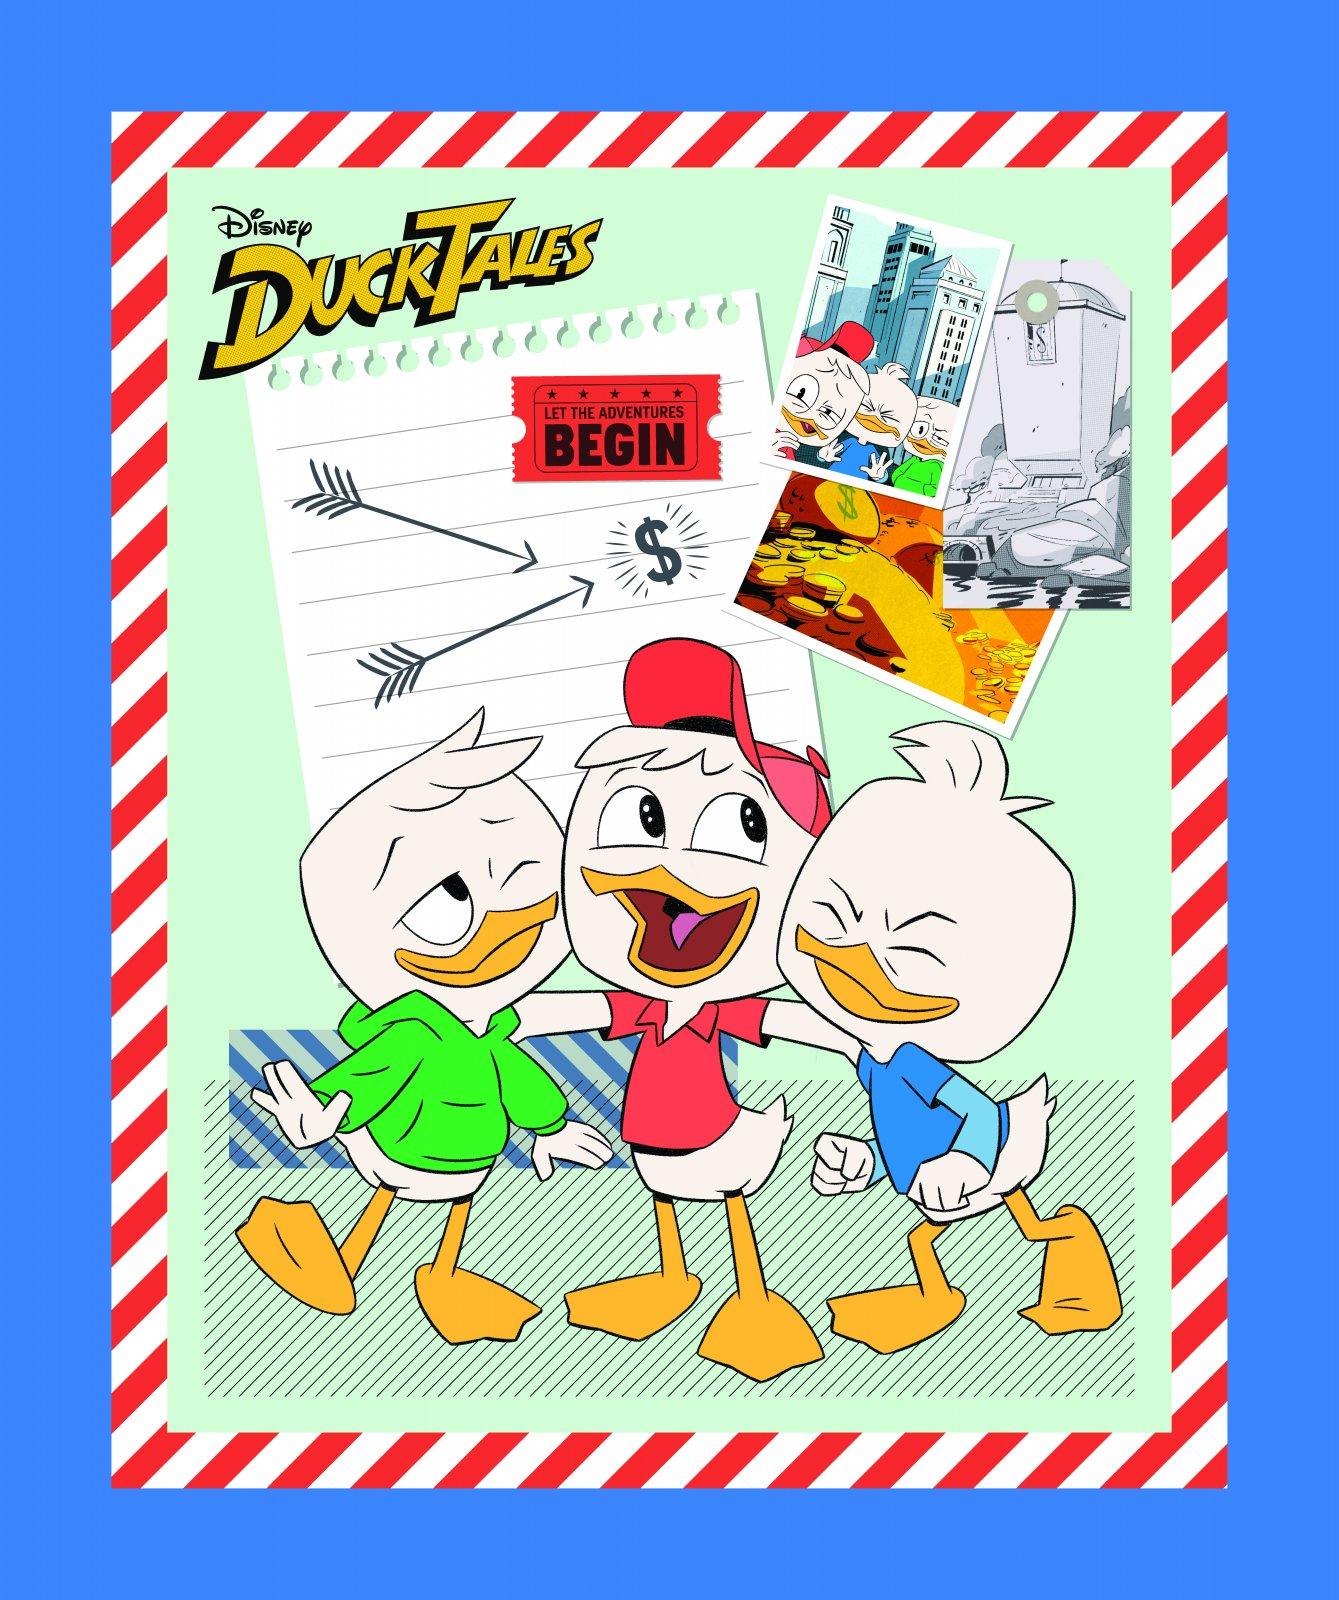 PROMO* SC-Disney Classic Ducktales 66236 Ducktales Panel